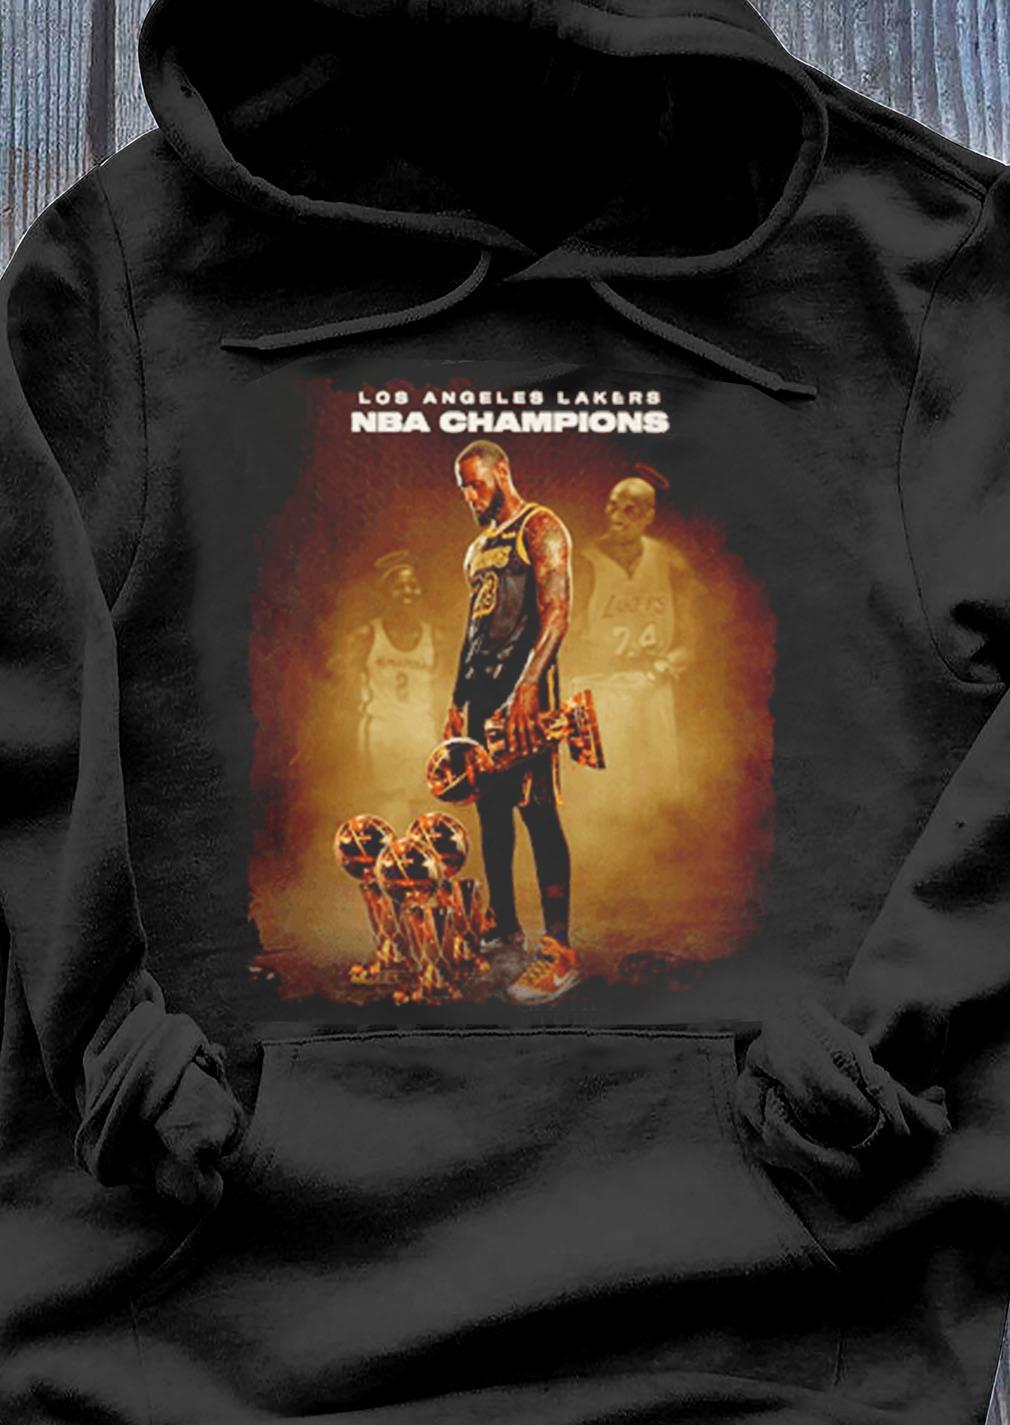 Lebron James Los Angeles Lakers Nba Champions Shirt Hoodie